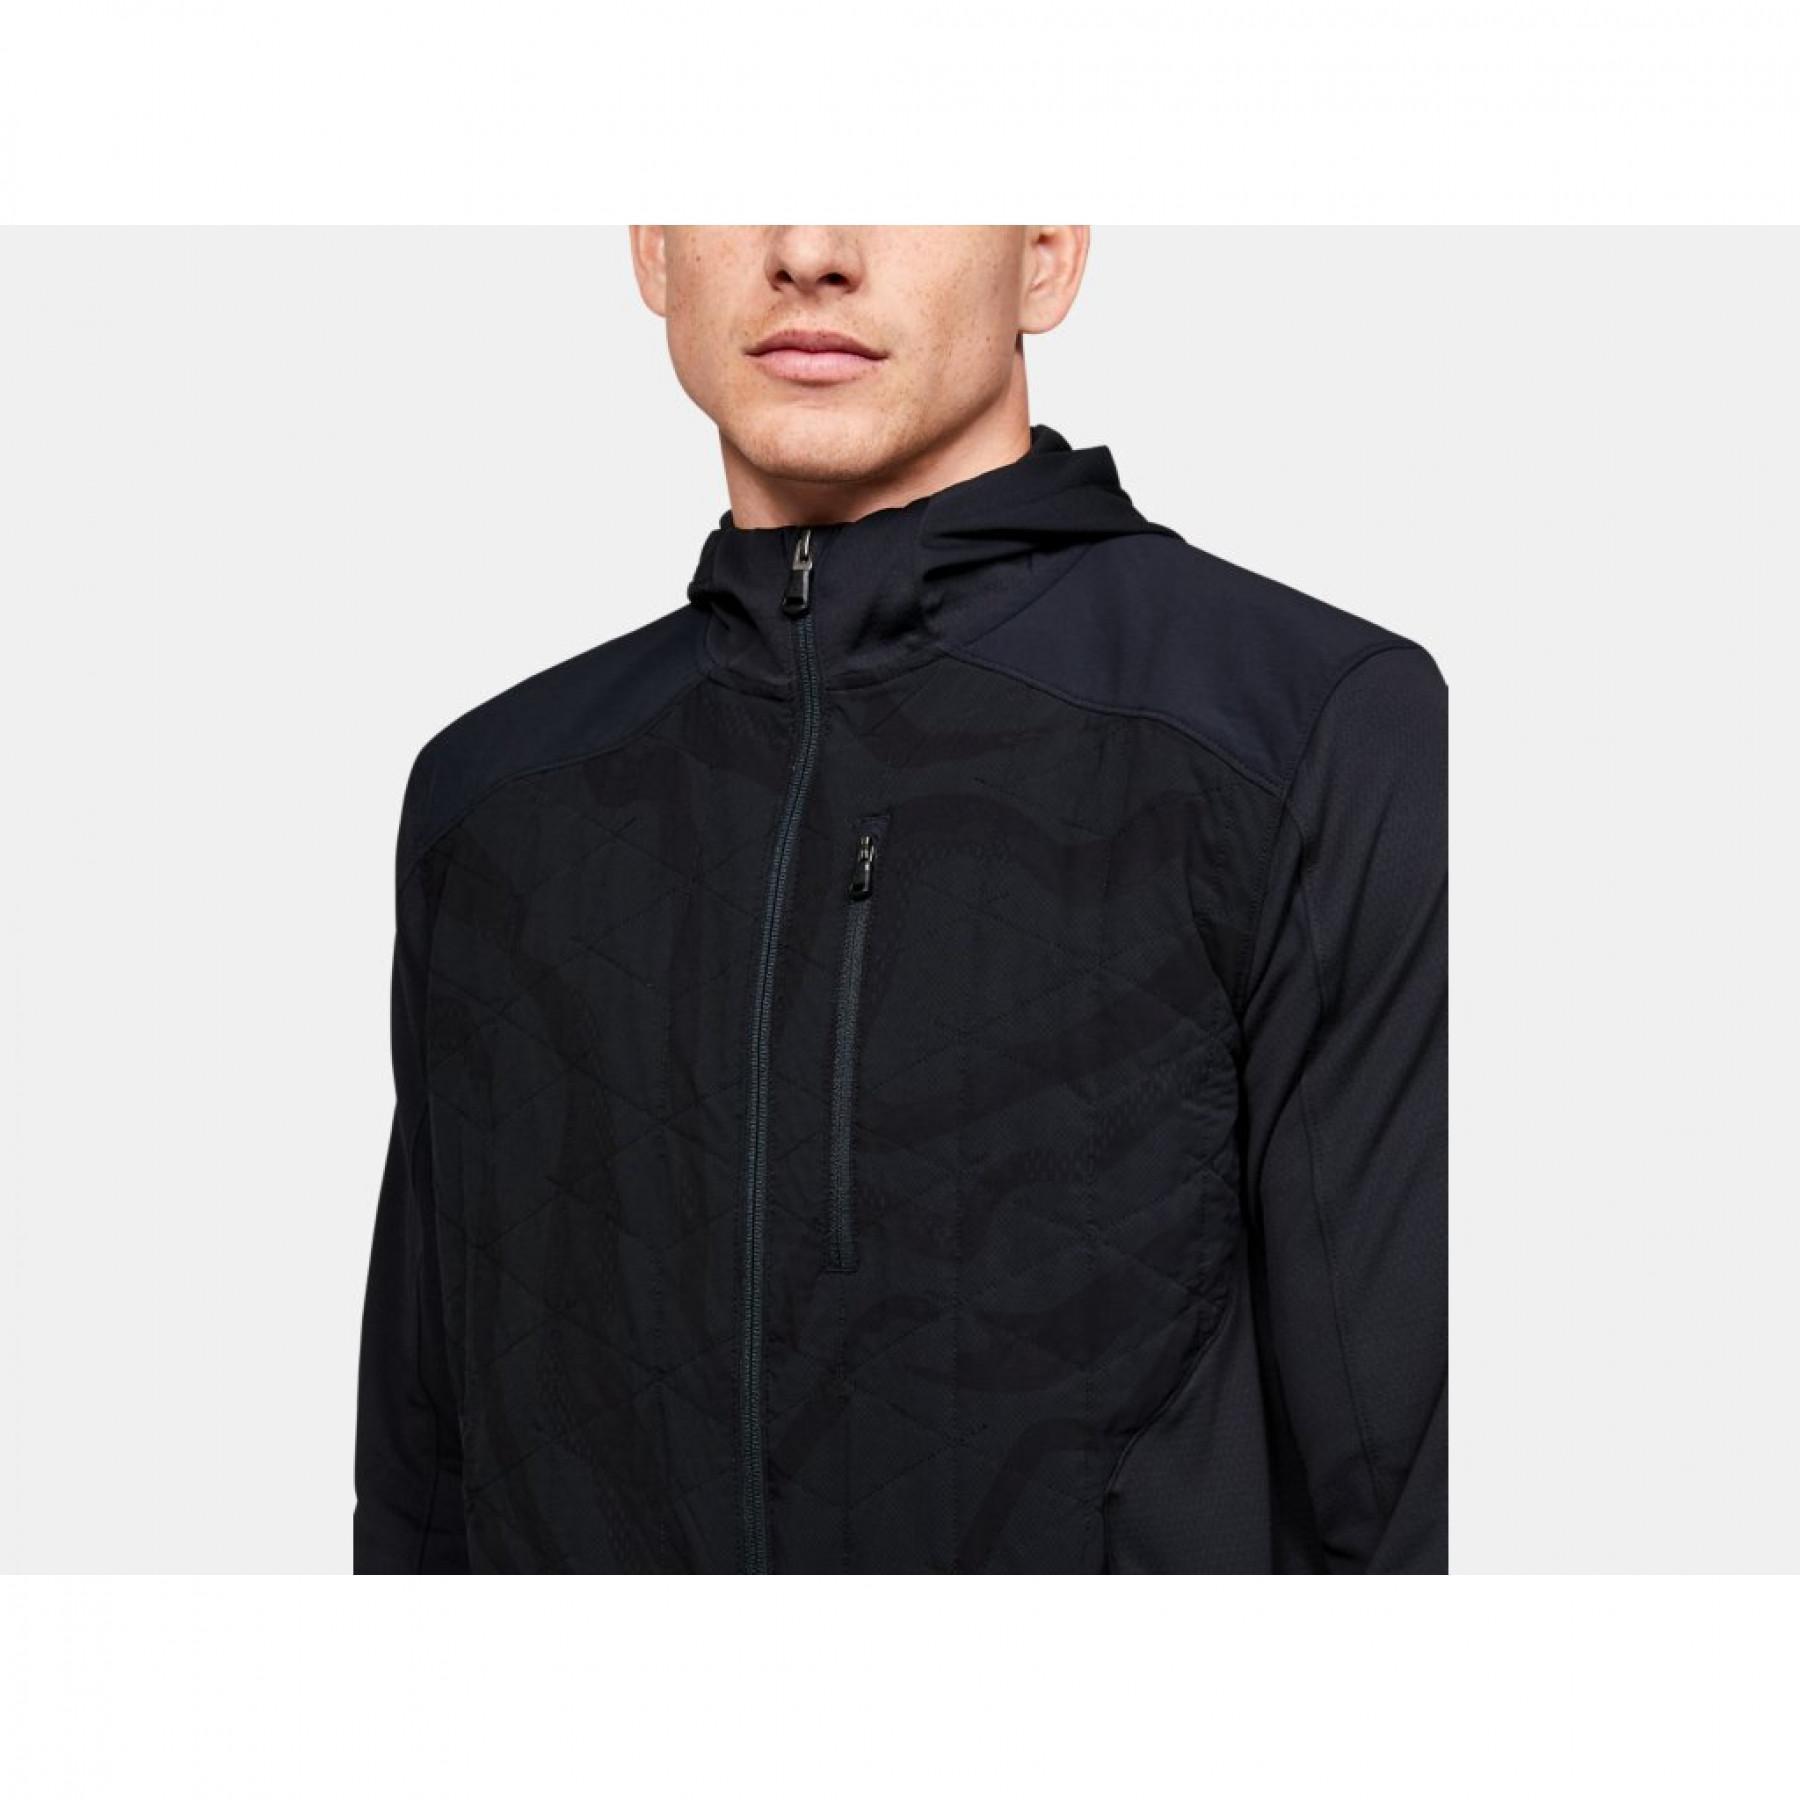 Under Armour ColdGear® Hybrid Reactor Lite Print Jacket